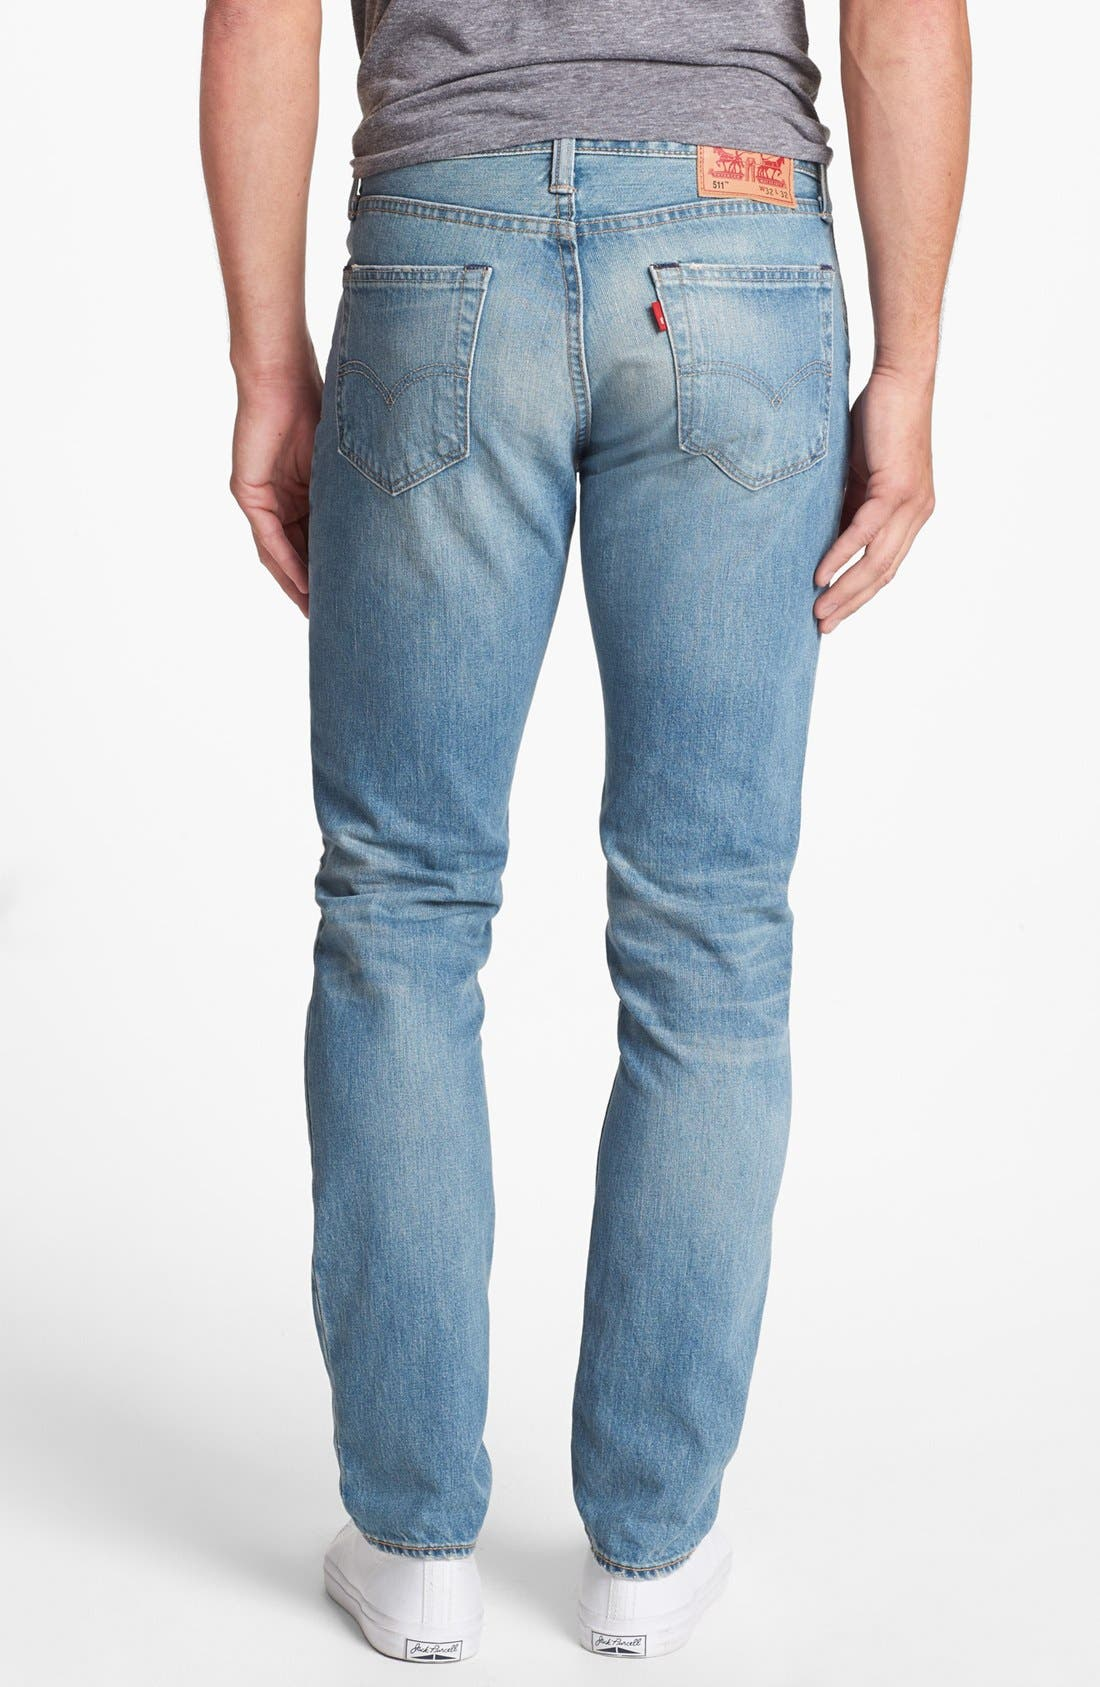 Alternate Image 1 Selected - Levi's® '511' Skinny Jeans (Whiskey)